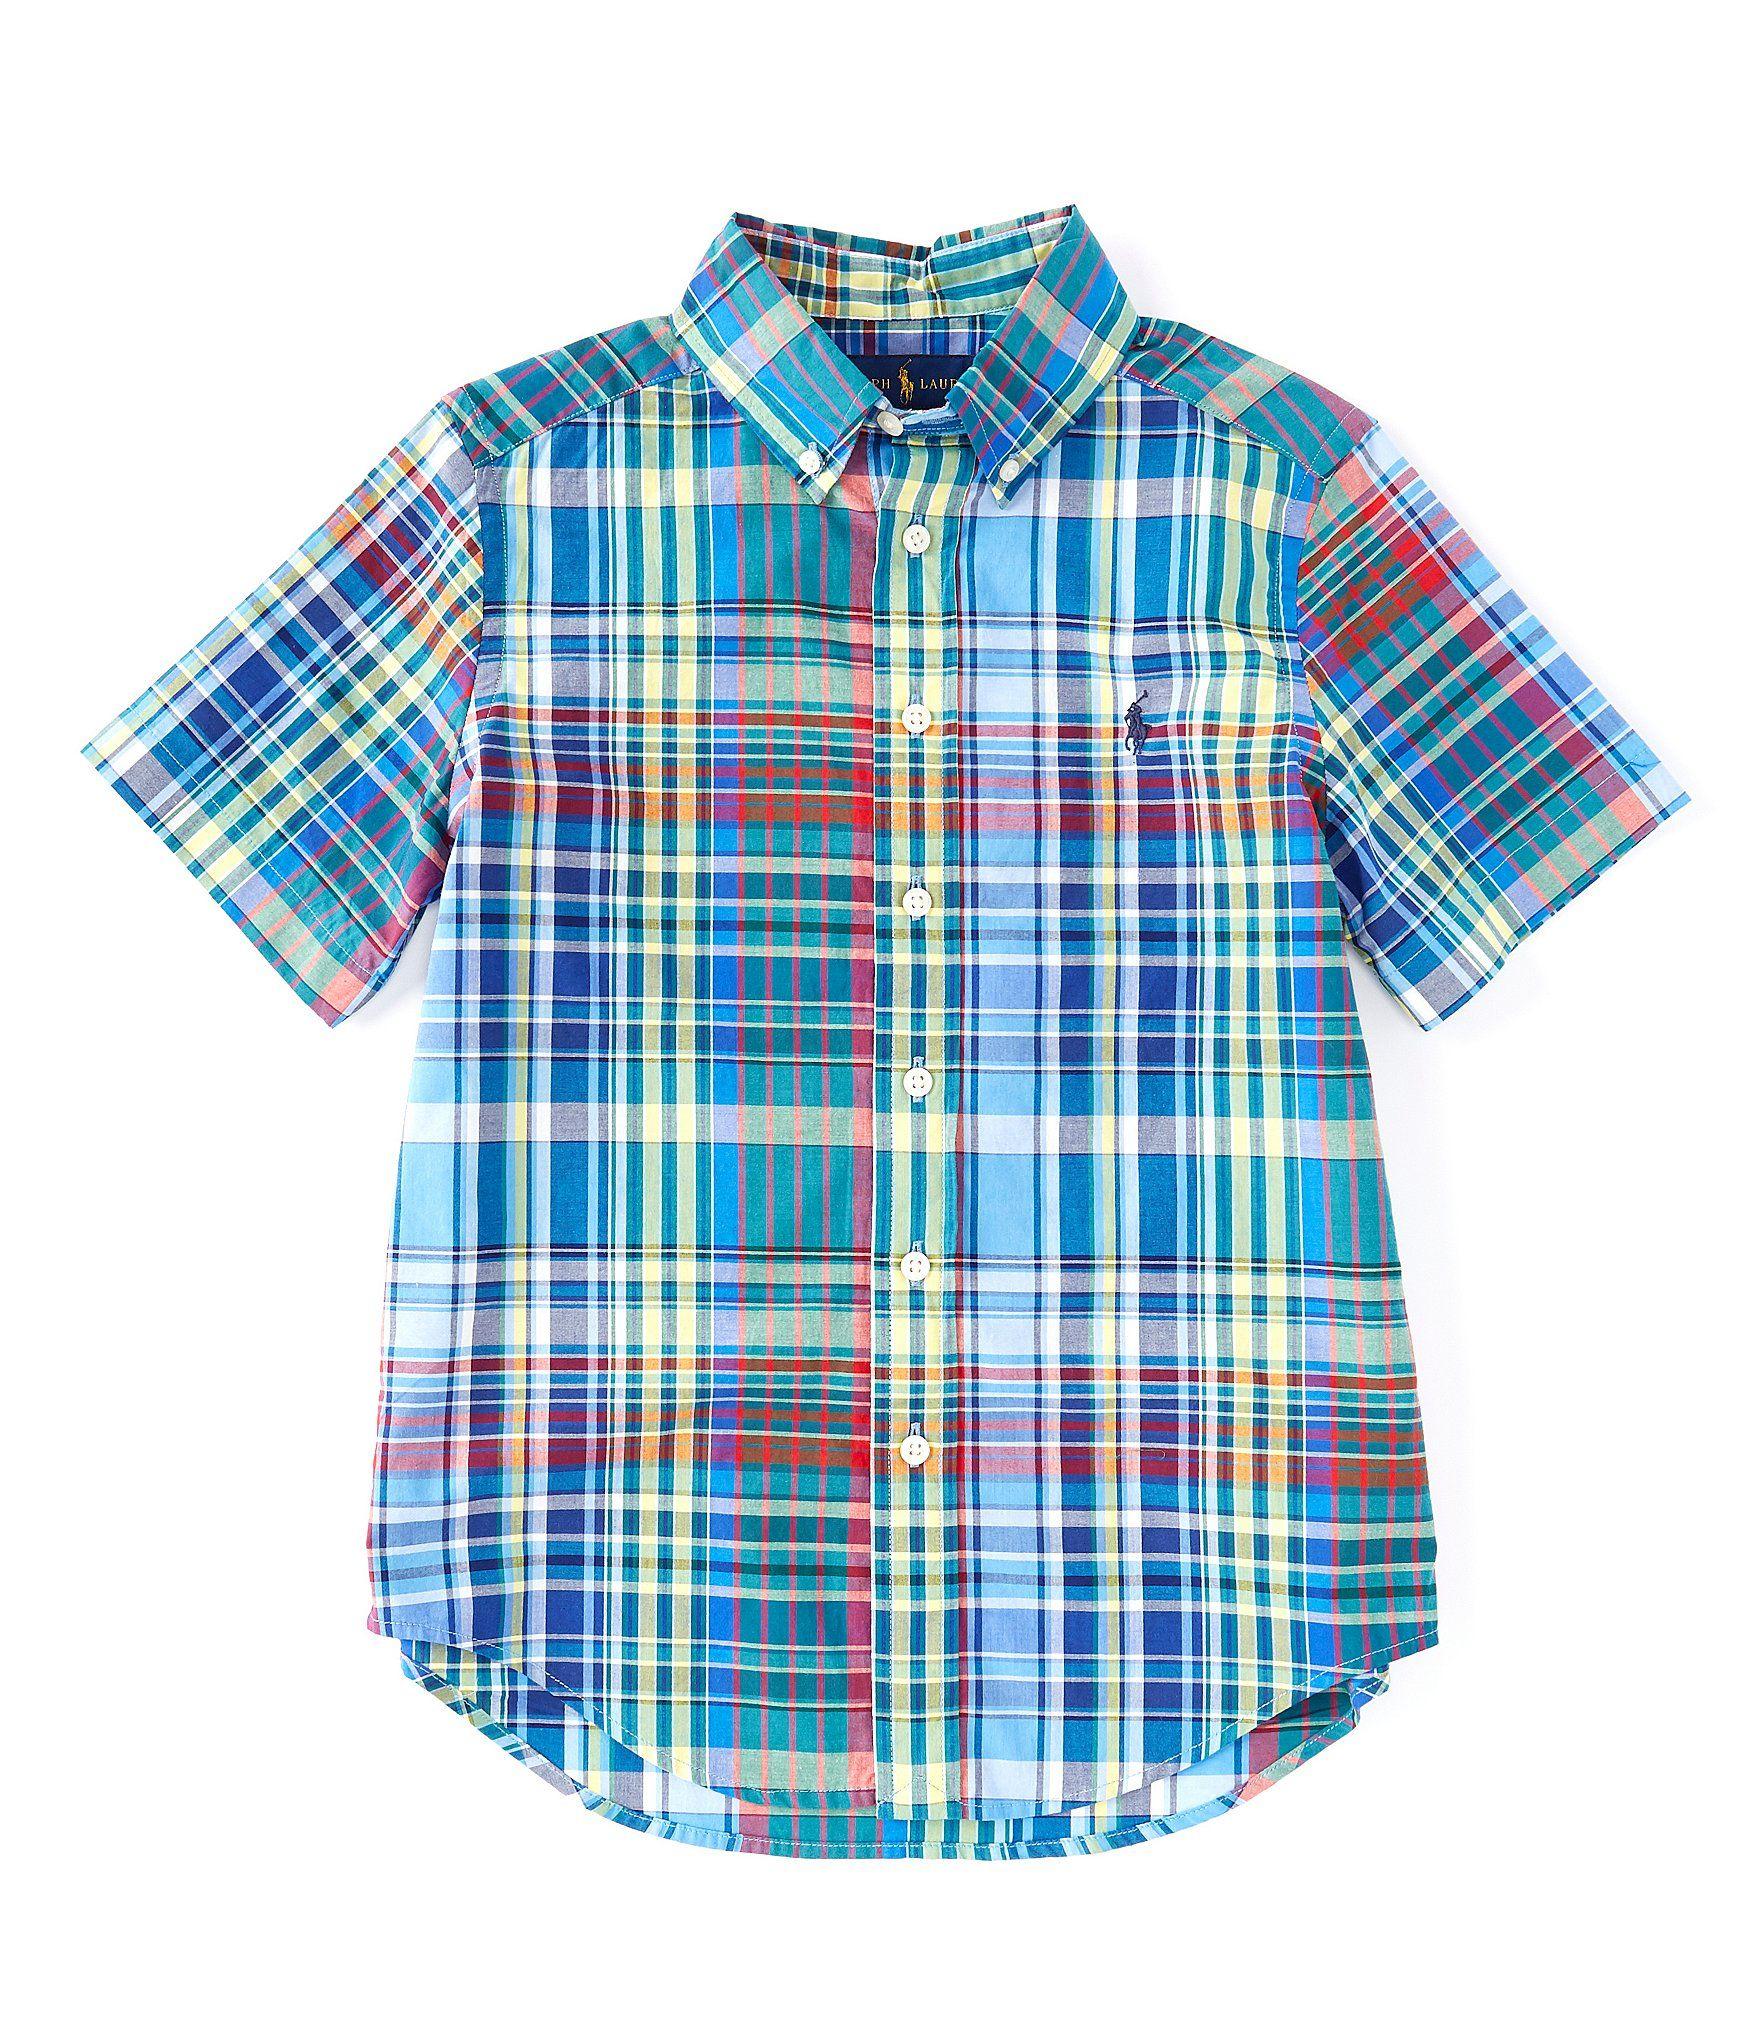 Ralph Lauren Childrenswear Big Boys 8-20 Short Sleeve Plaid Shirt – Blue/Yellow Multi L